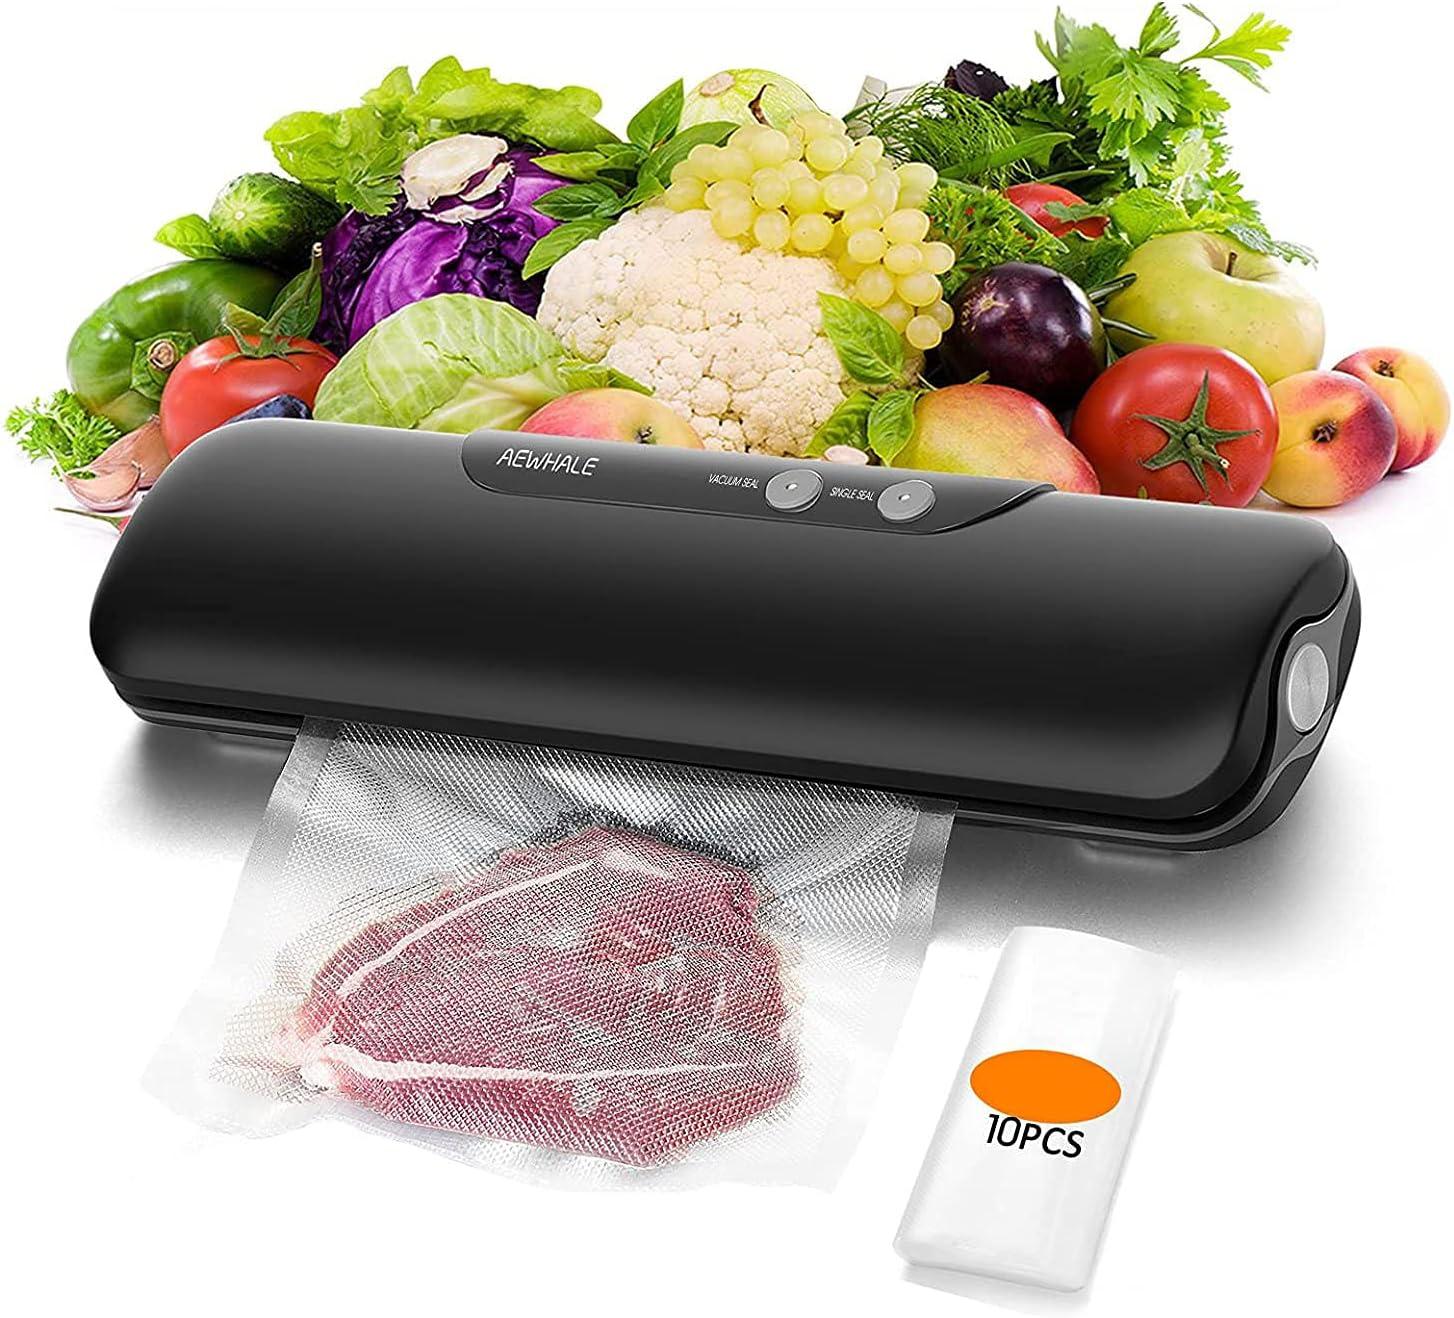 AEWHALE Vacuum Sealer Machine Food Saver, Automatic Food Sealer Vacuum Packing Machine for Food Preservation with 10Pcs Vacuum Bags, Black